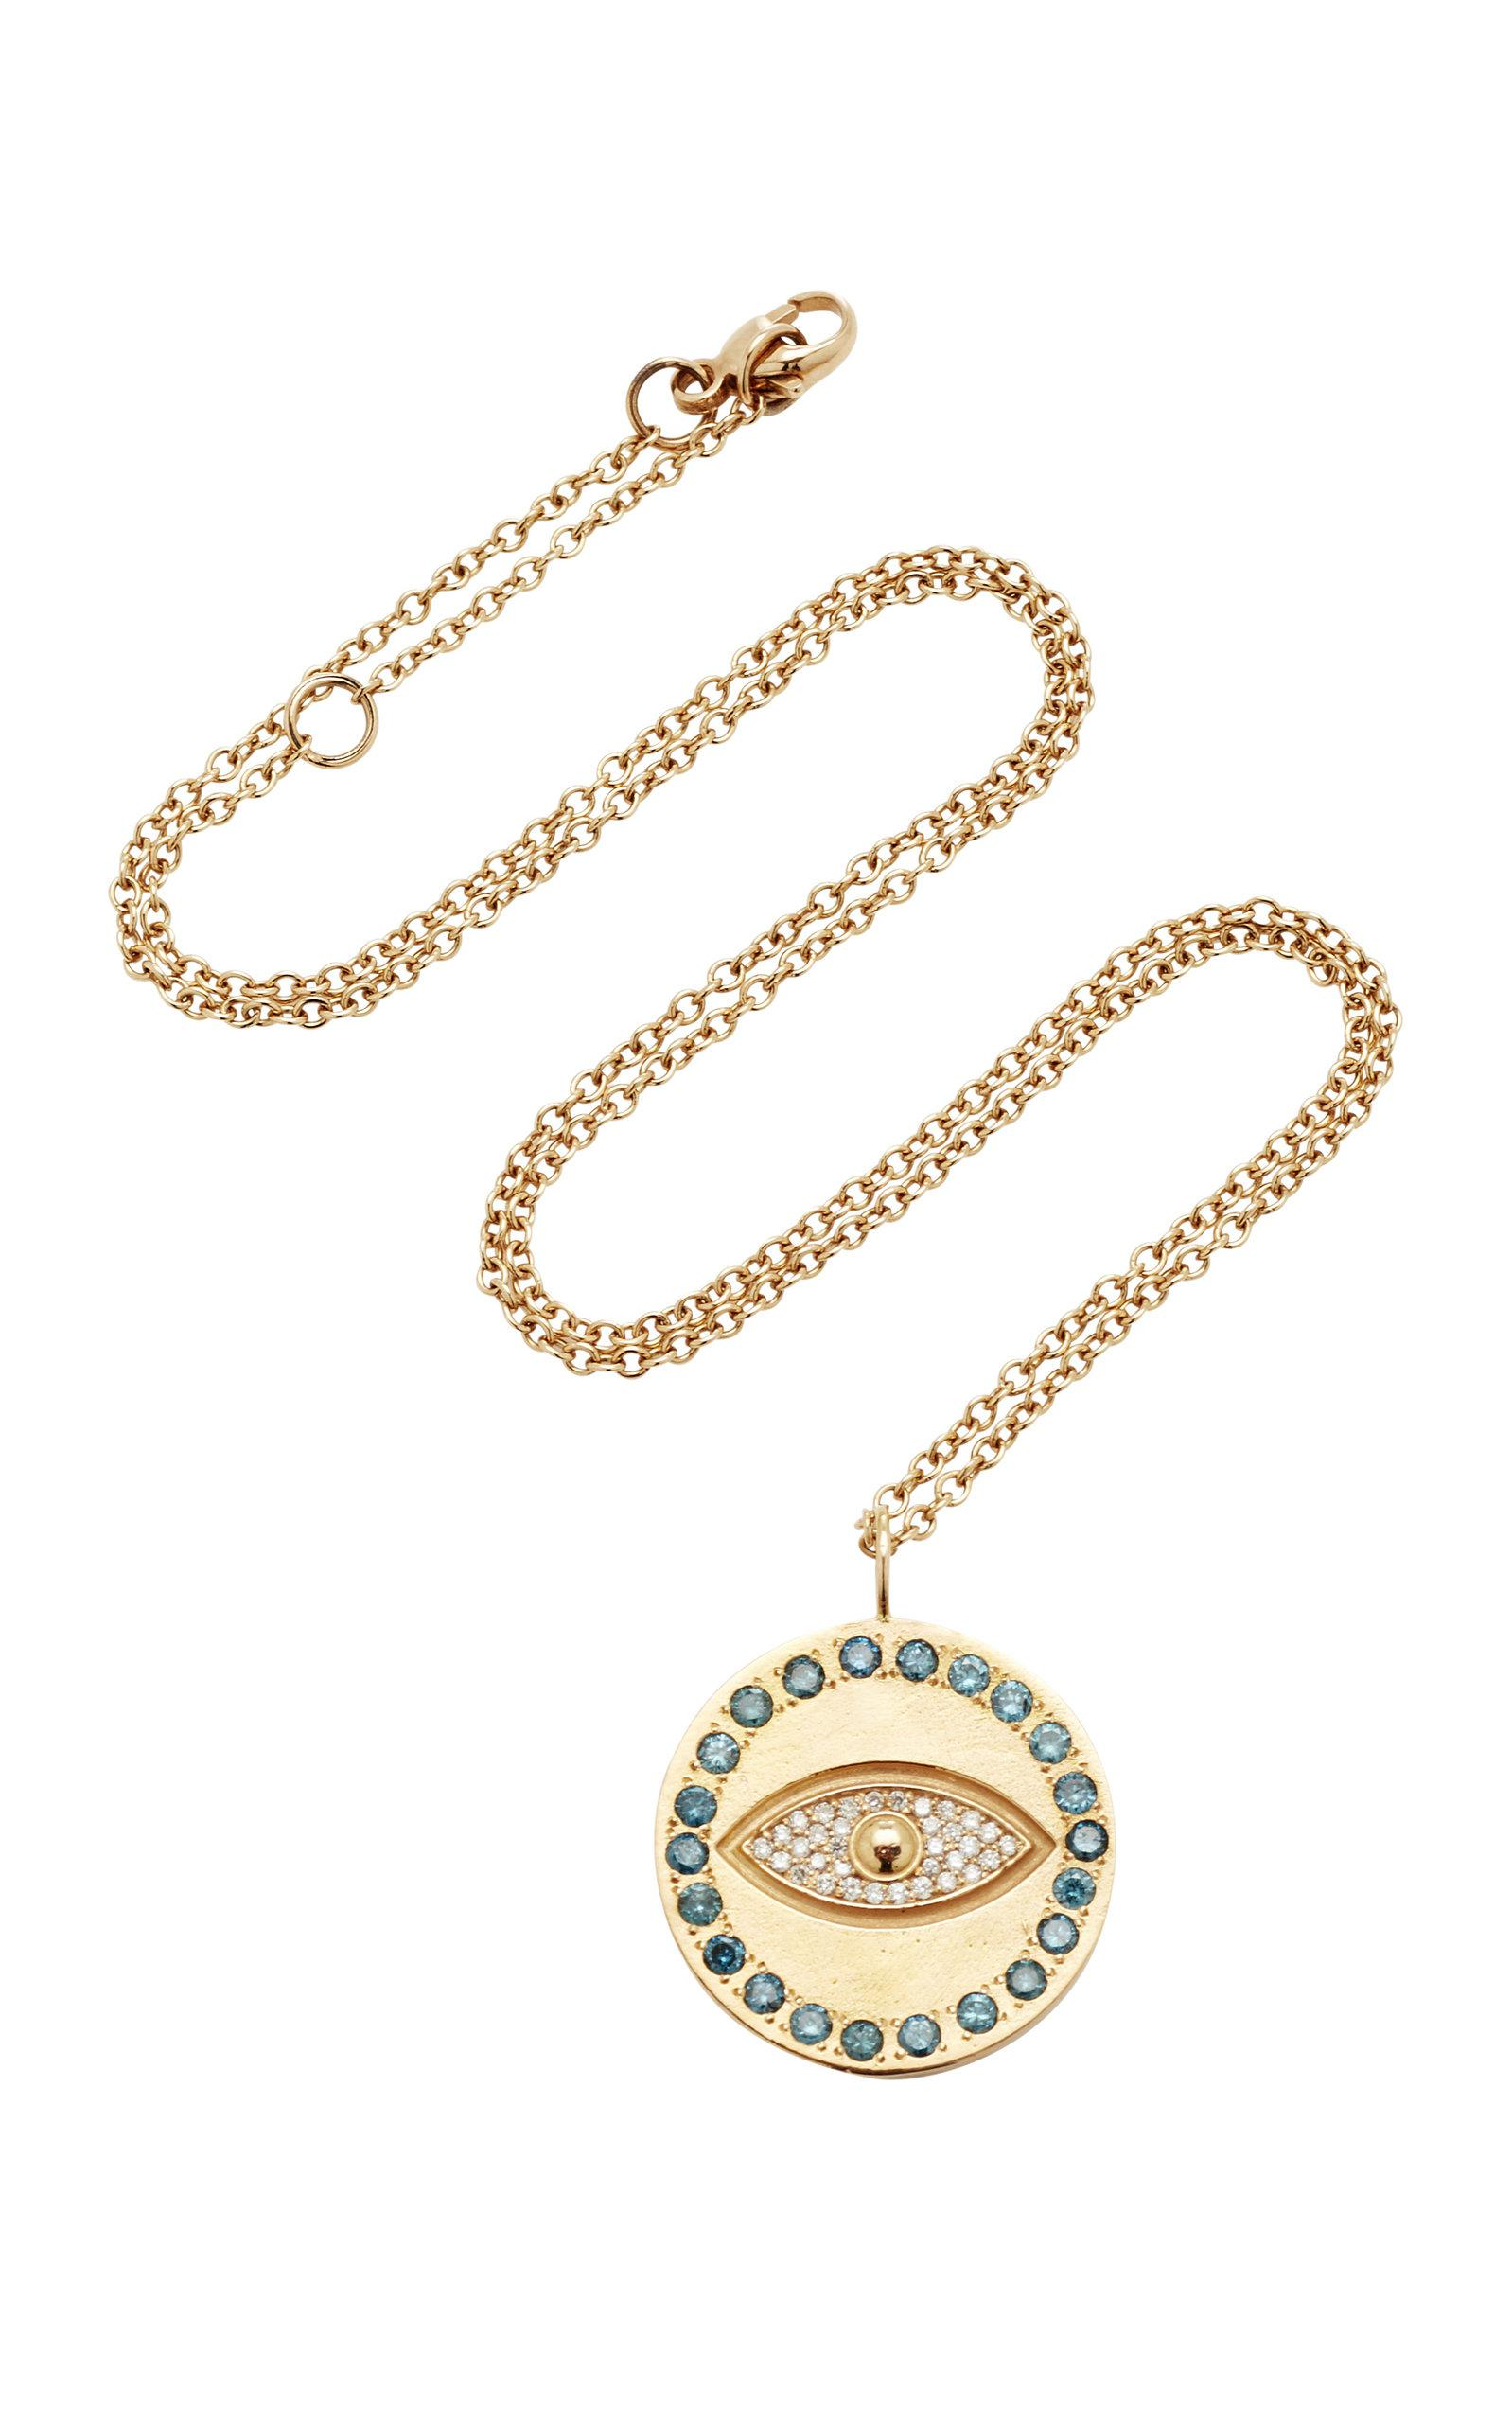 Snake Charm 18K White Gold Black and White Diamond Necklace Misahara trnaq